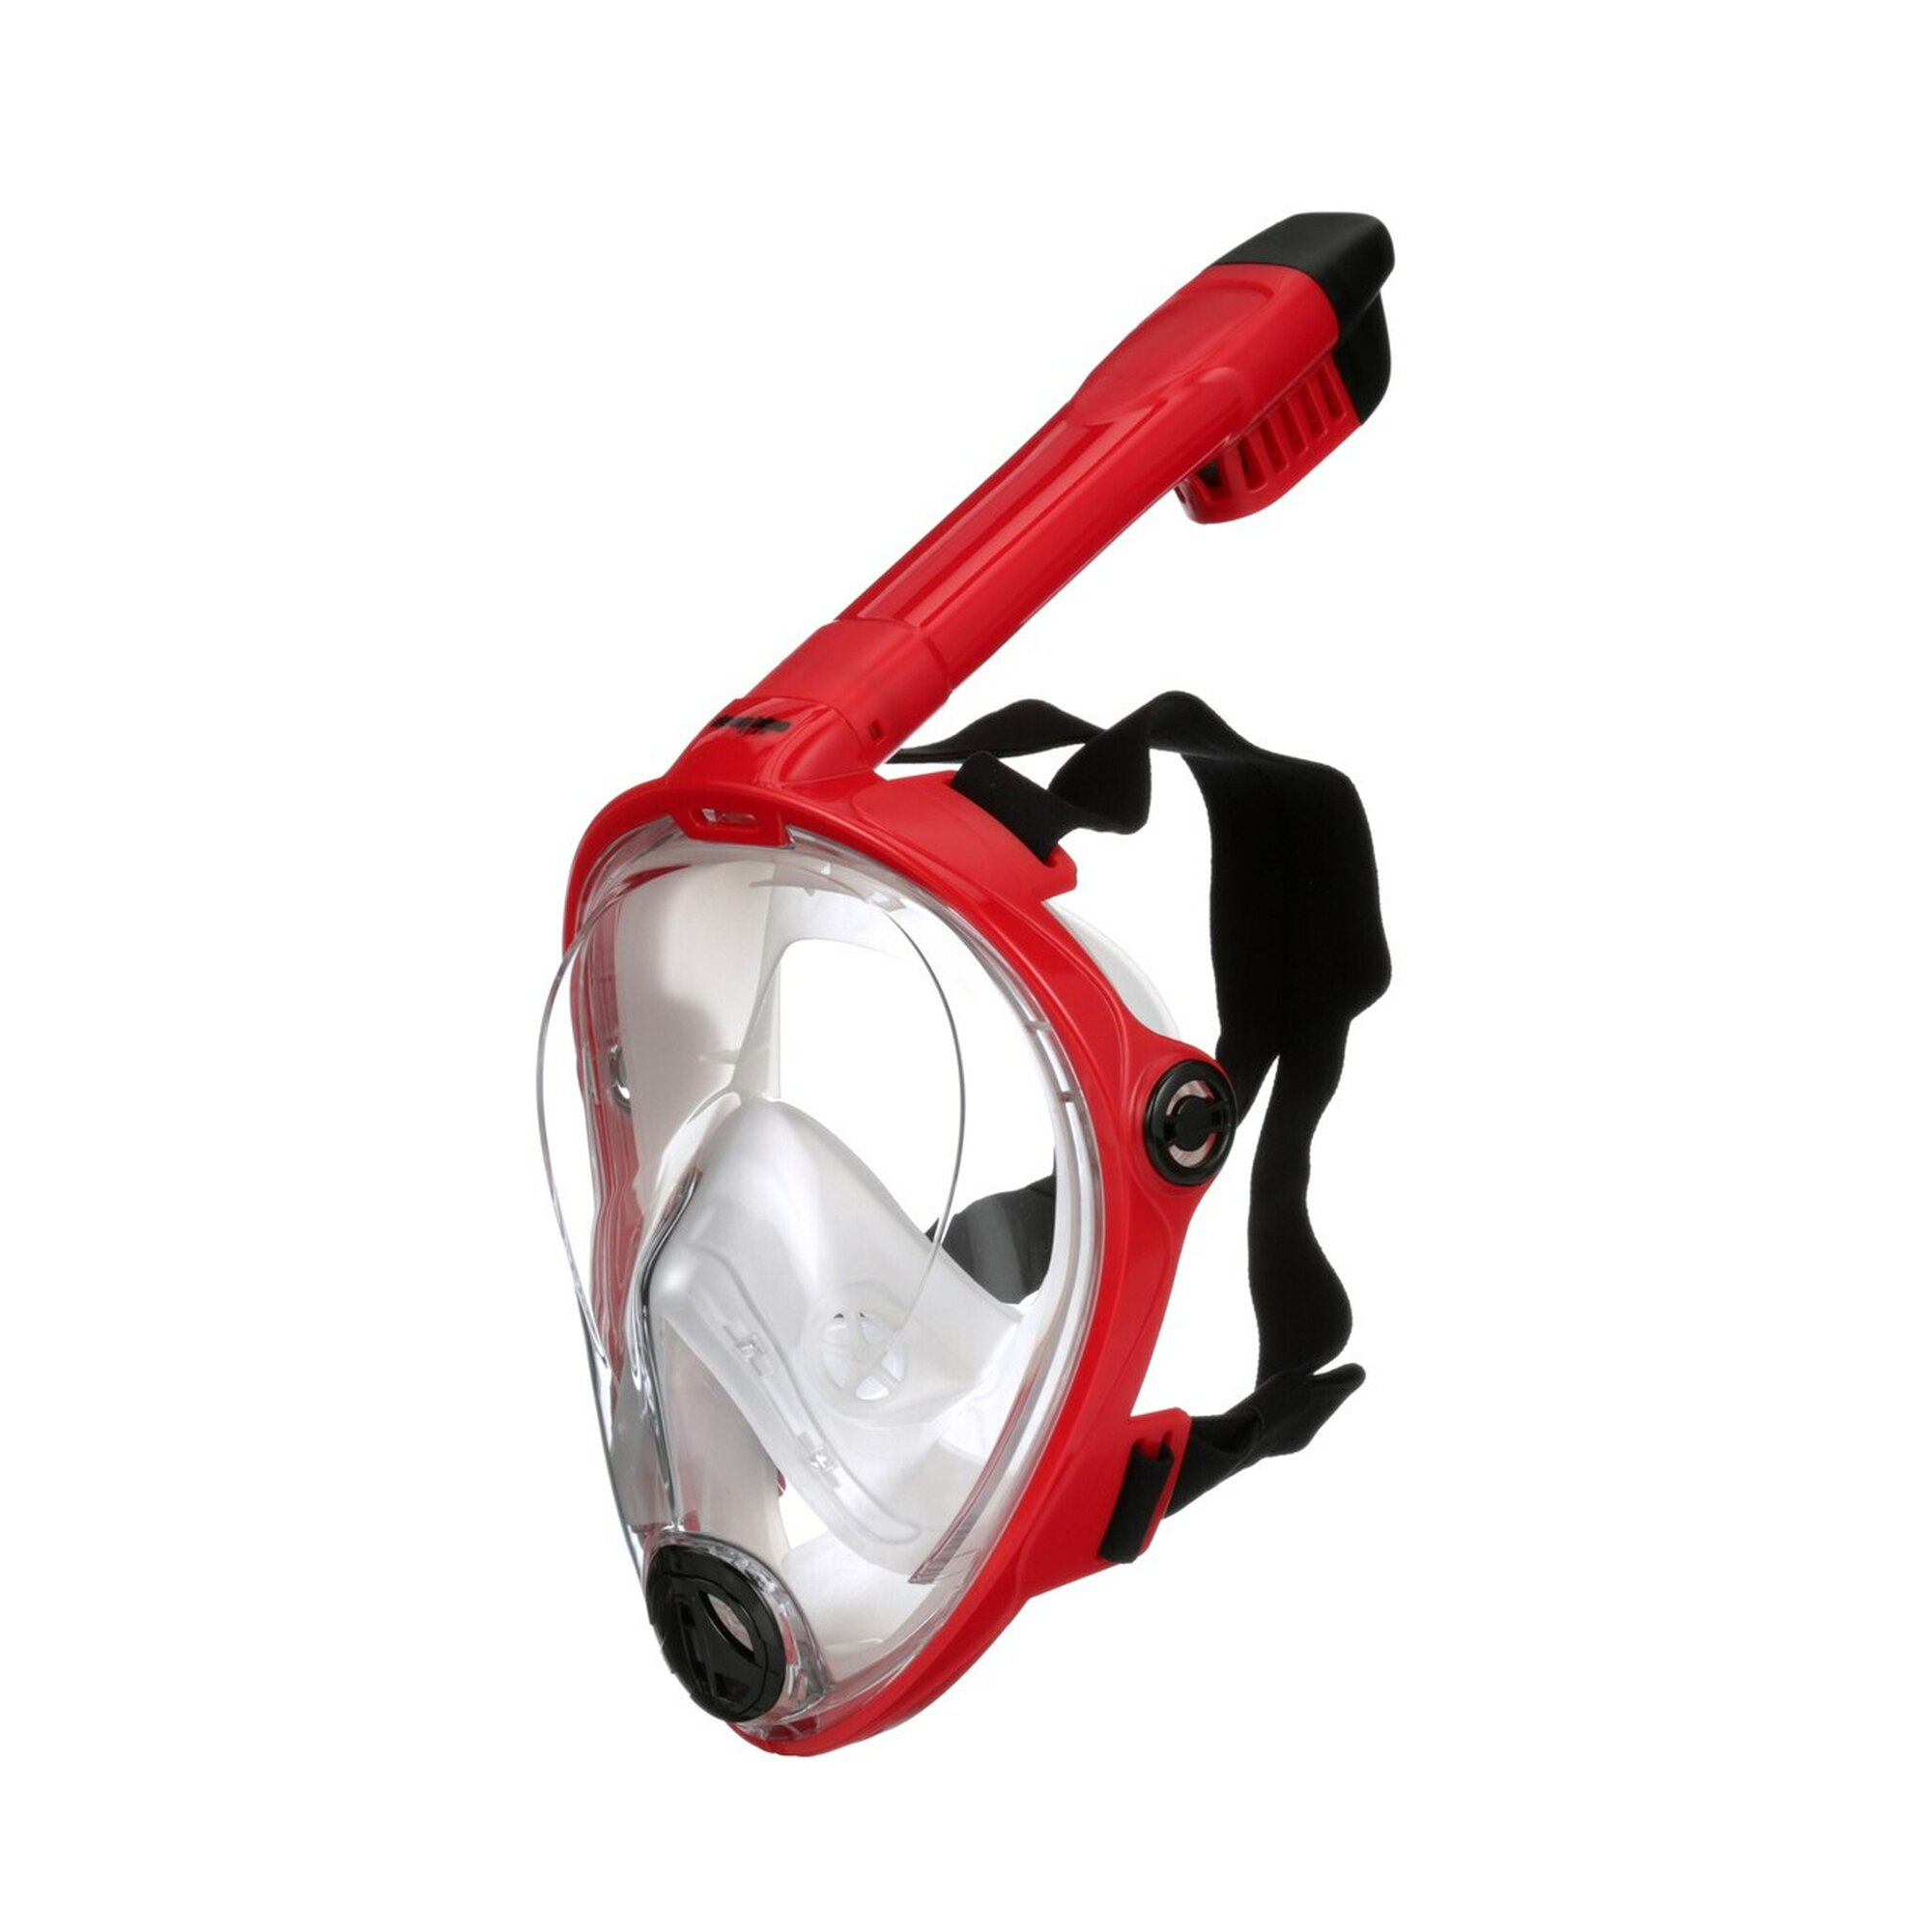 Full Face Mask - Adult Snorkeling Set